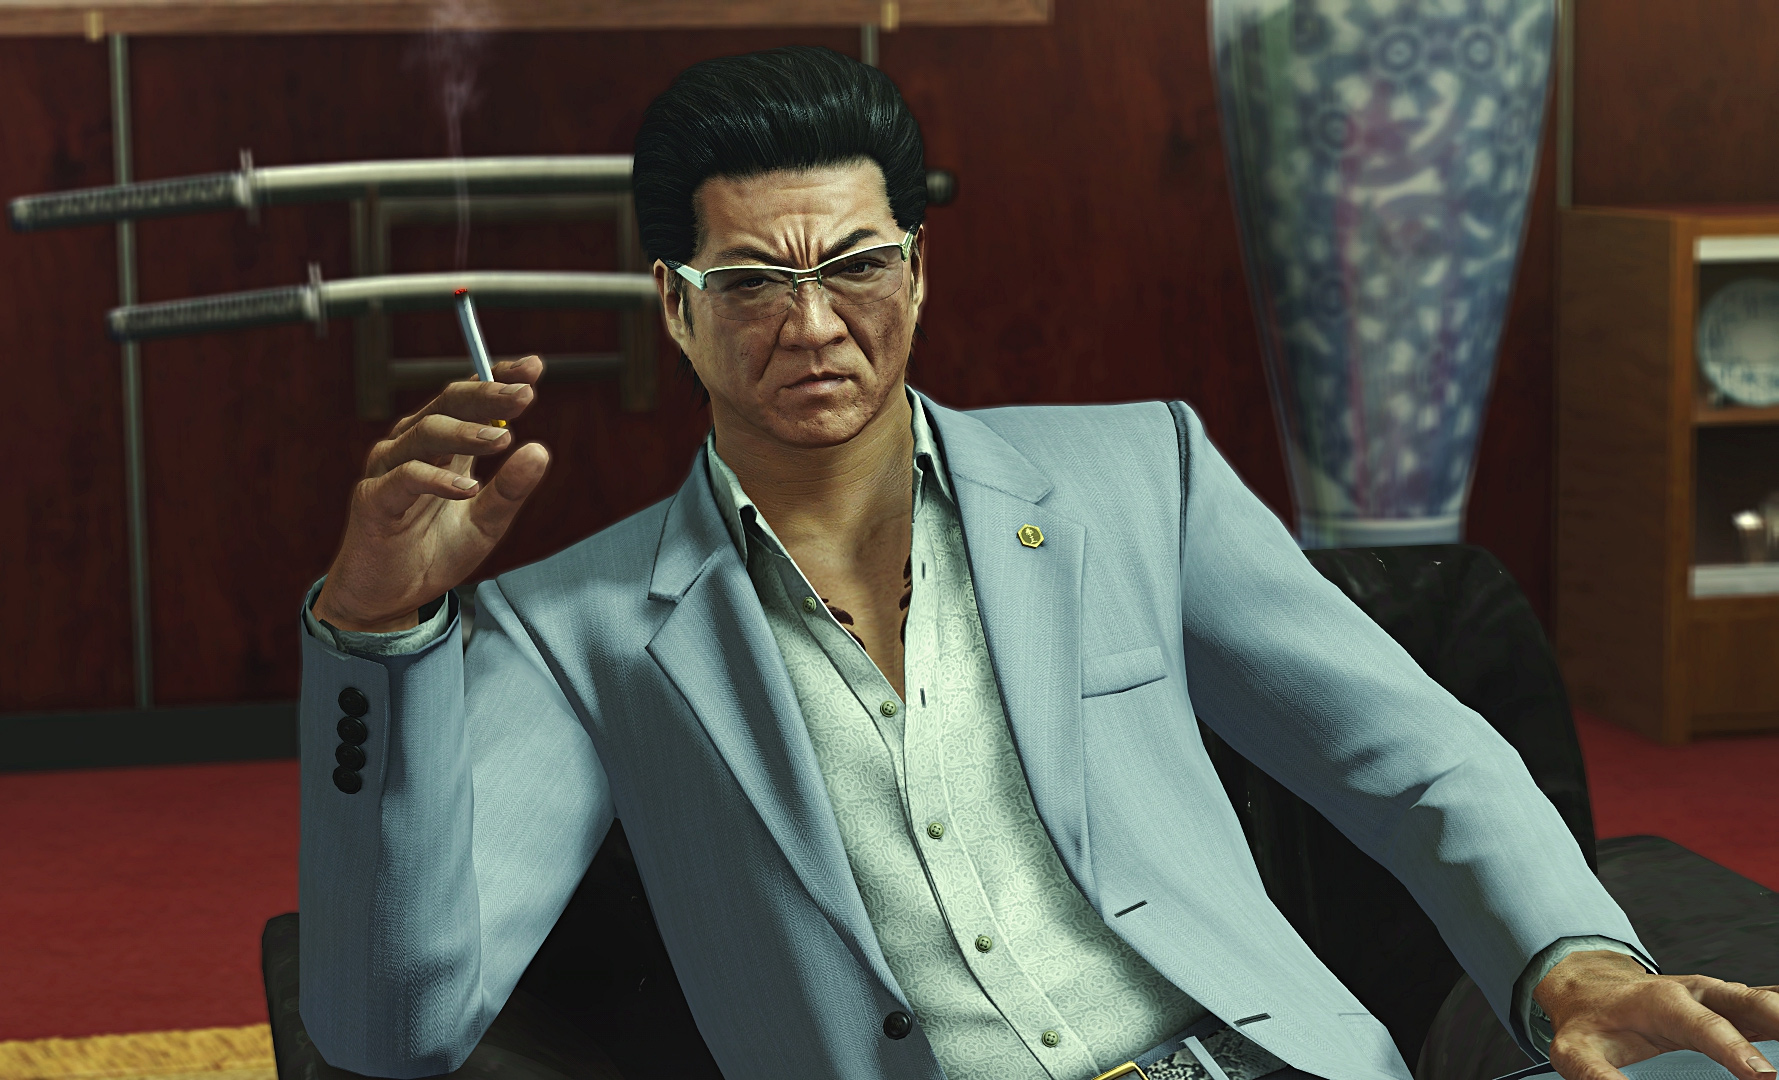 Yakuza 0 is off to a bumpy start on PC as Sega rolls back its first patch screenshot